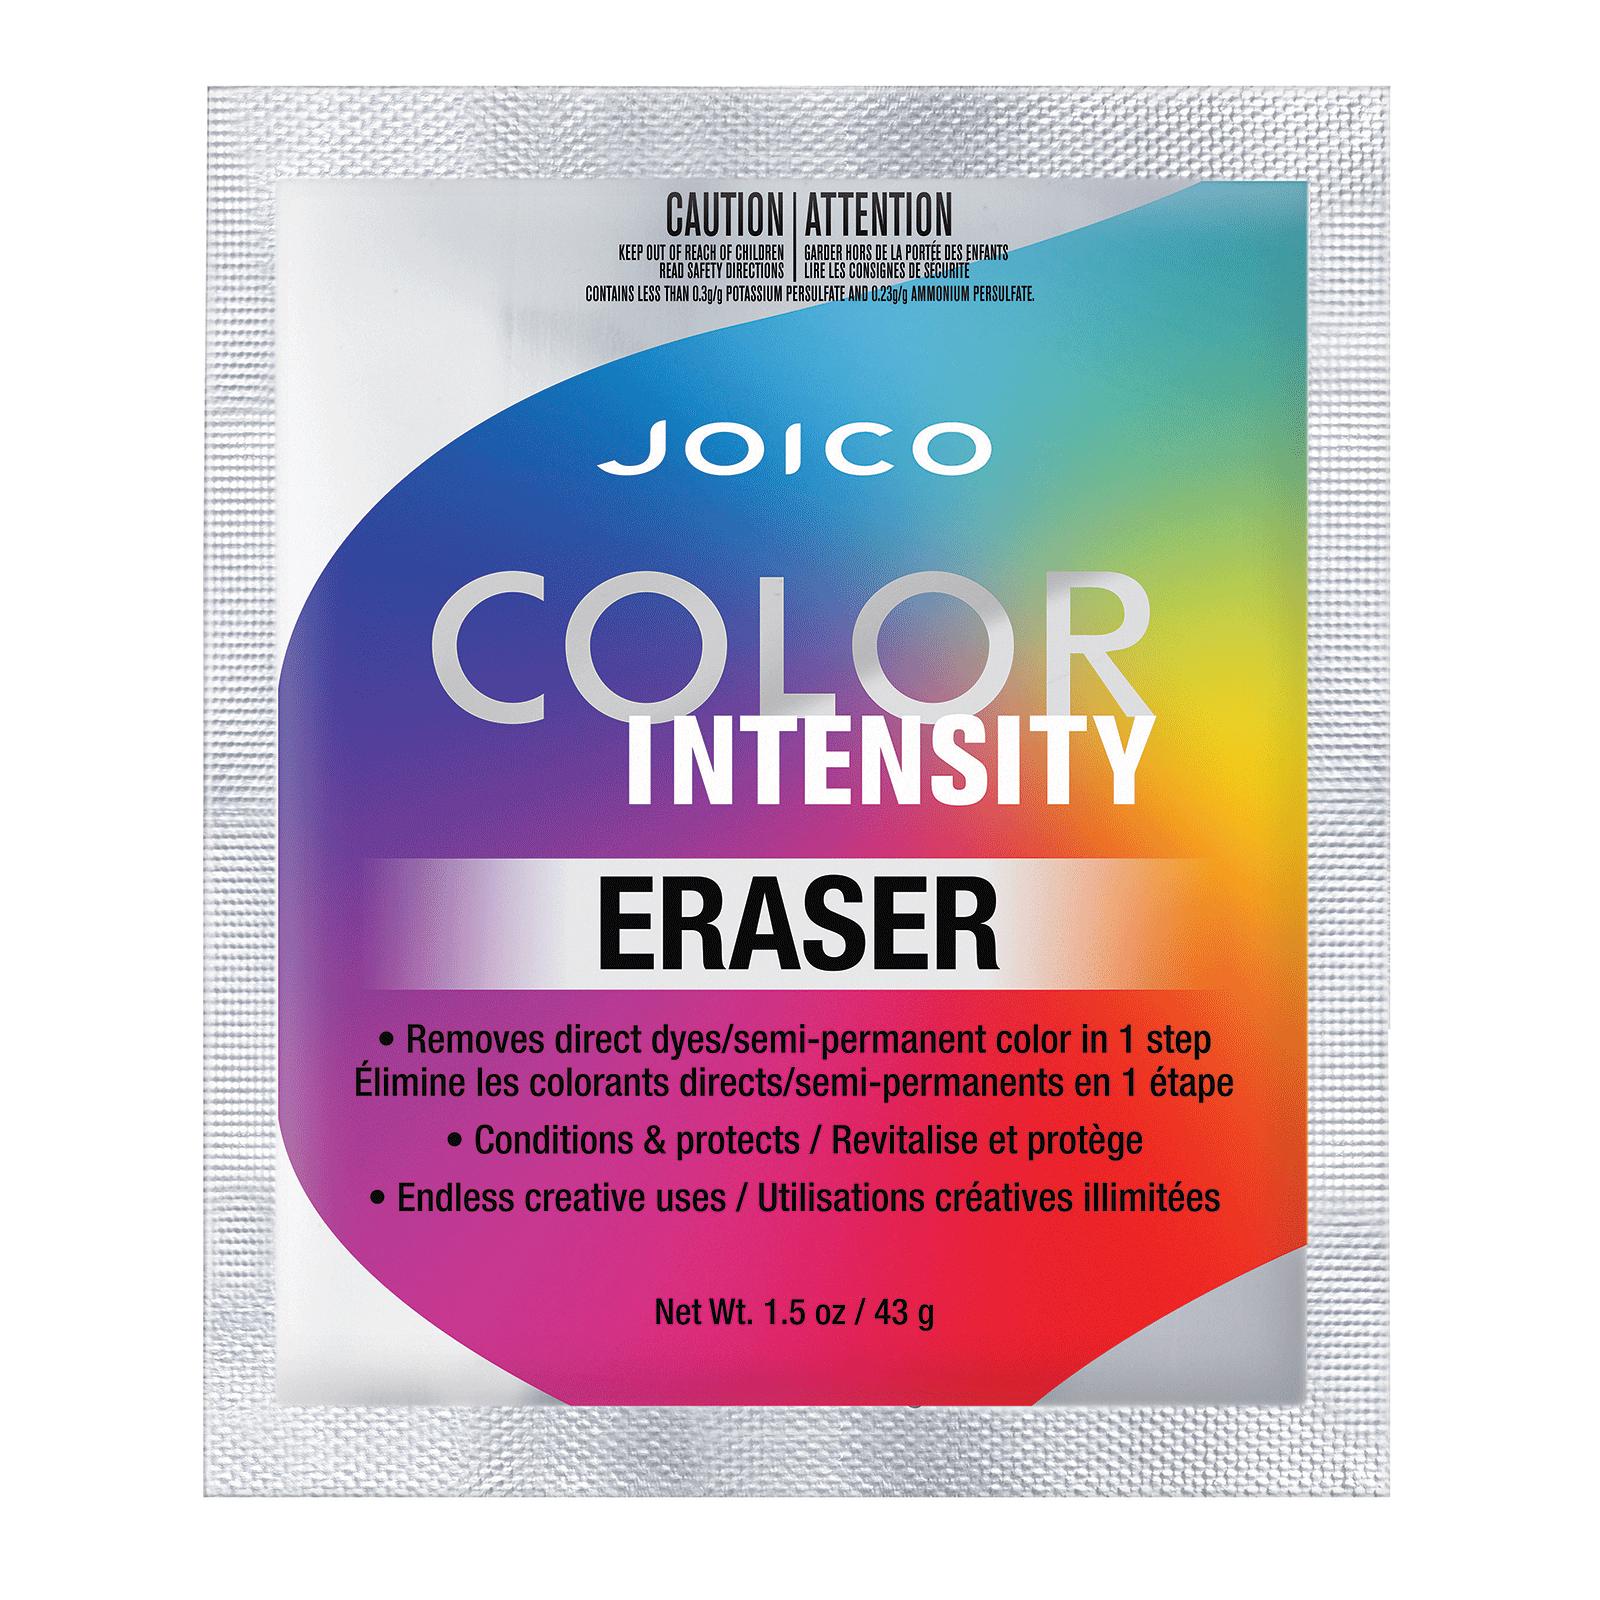 Joico vero k pak color intensity eraser 43g joico haircare joico vero k pak color intensity eraser 43g nvjuhfo Image collections